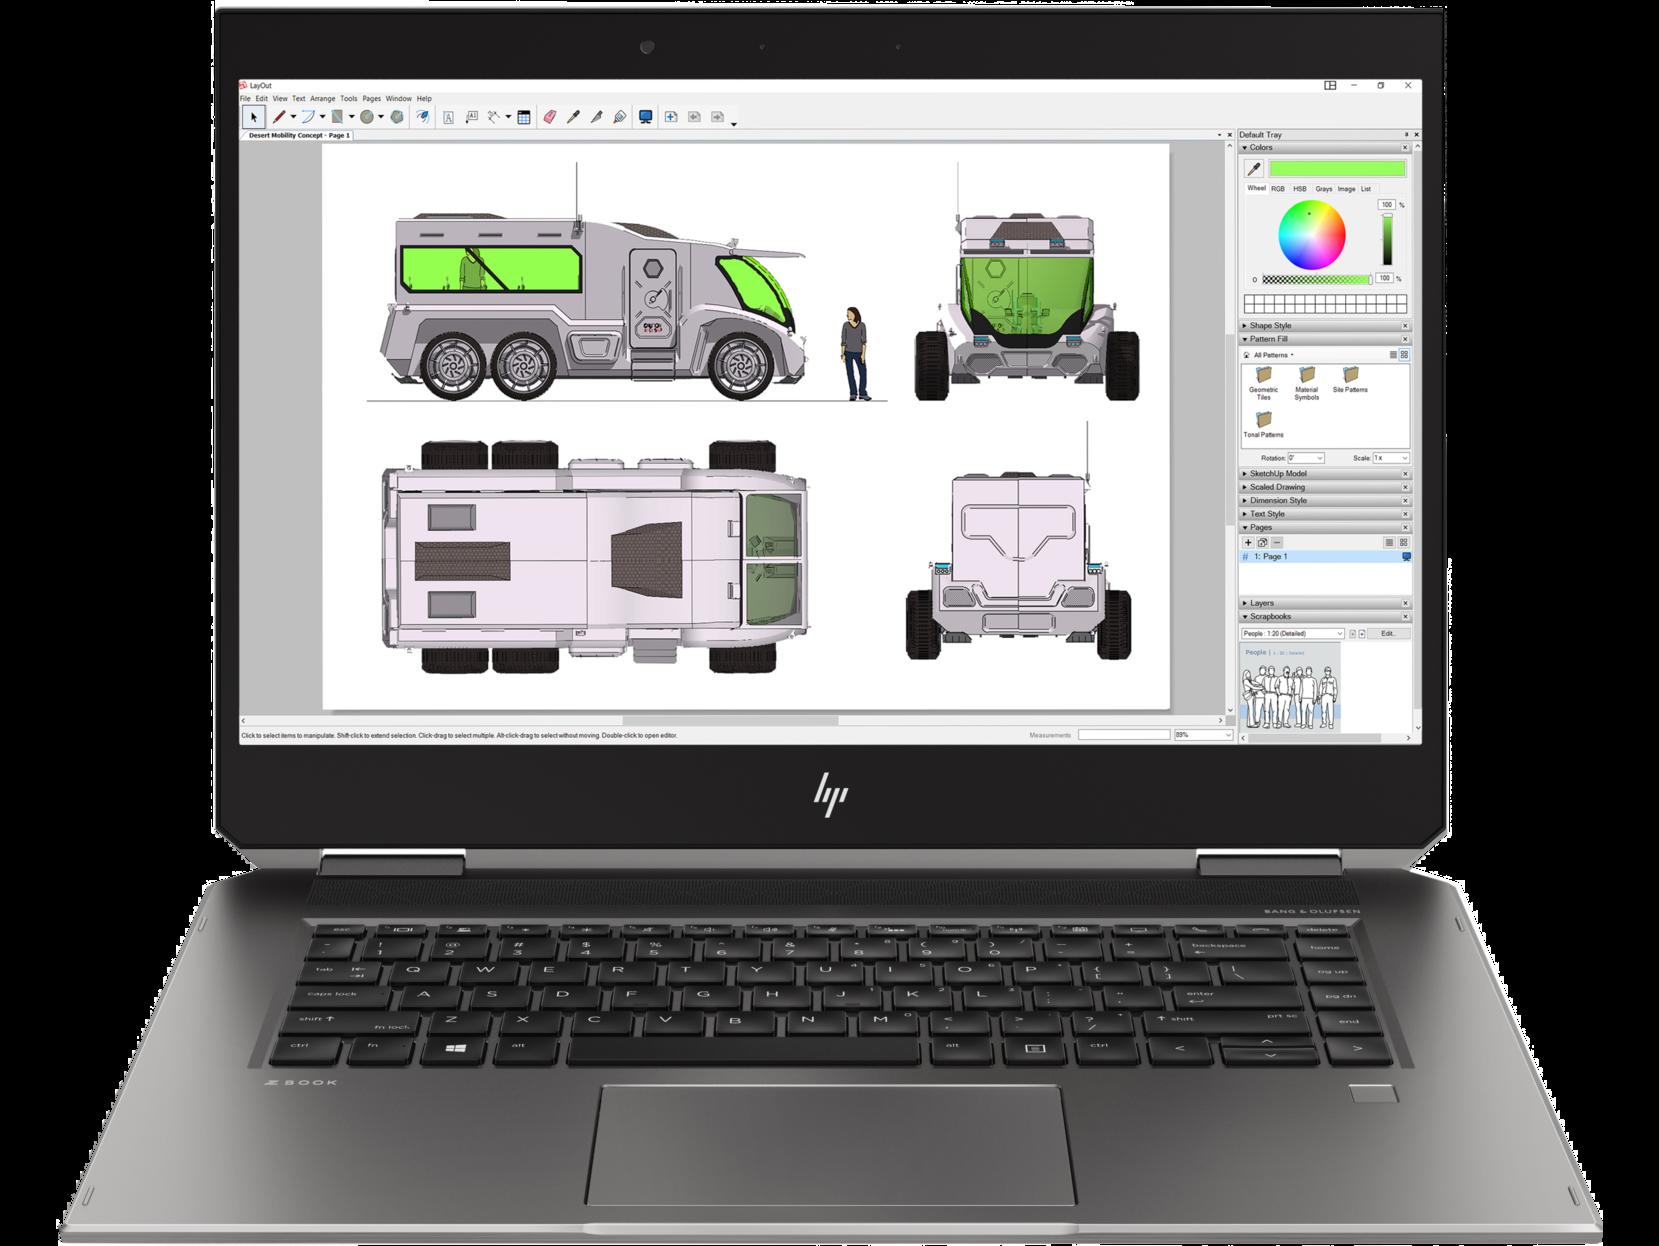 Notebook HP ZBook x360 Studio G5 15.6 Full HD Intel Core i7-8750H RAM 8GB SSD 256GB Windows 10 Pro